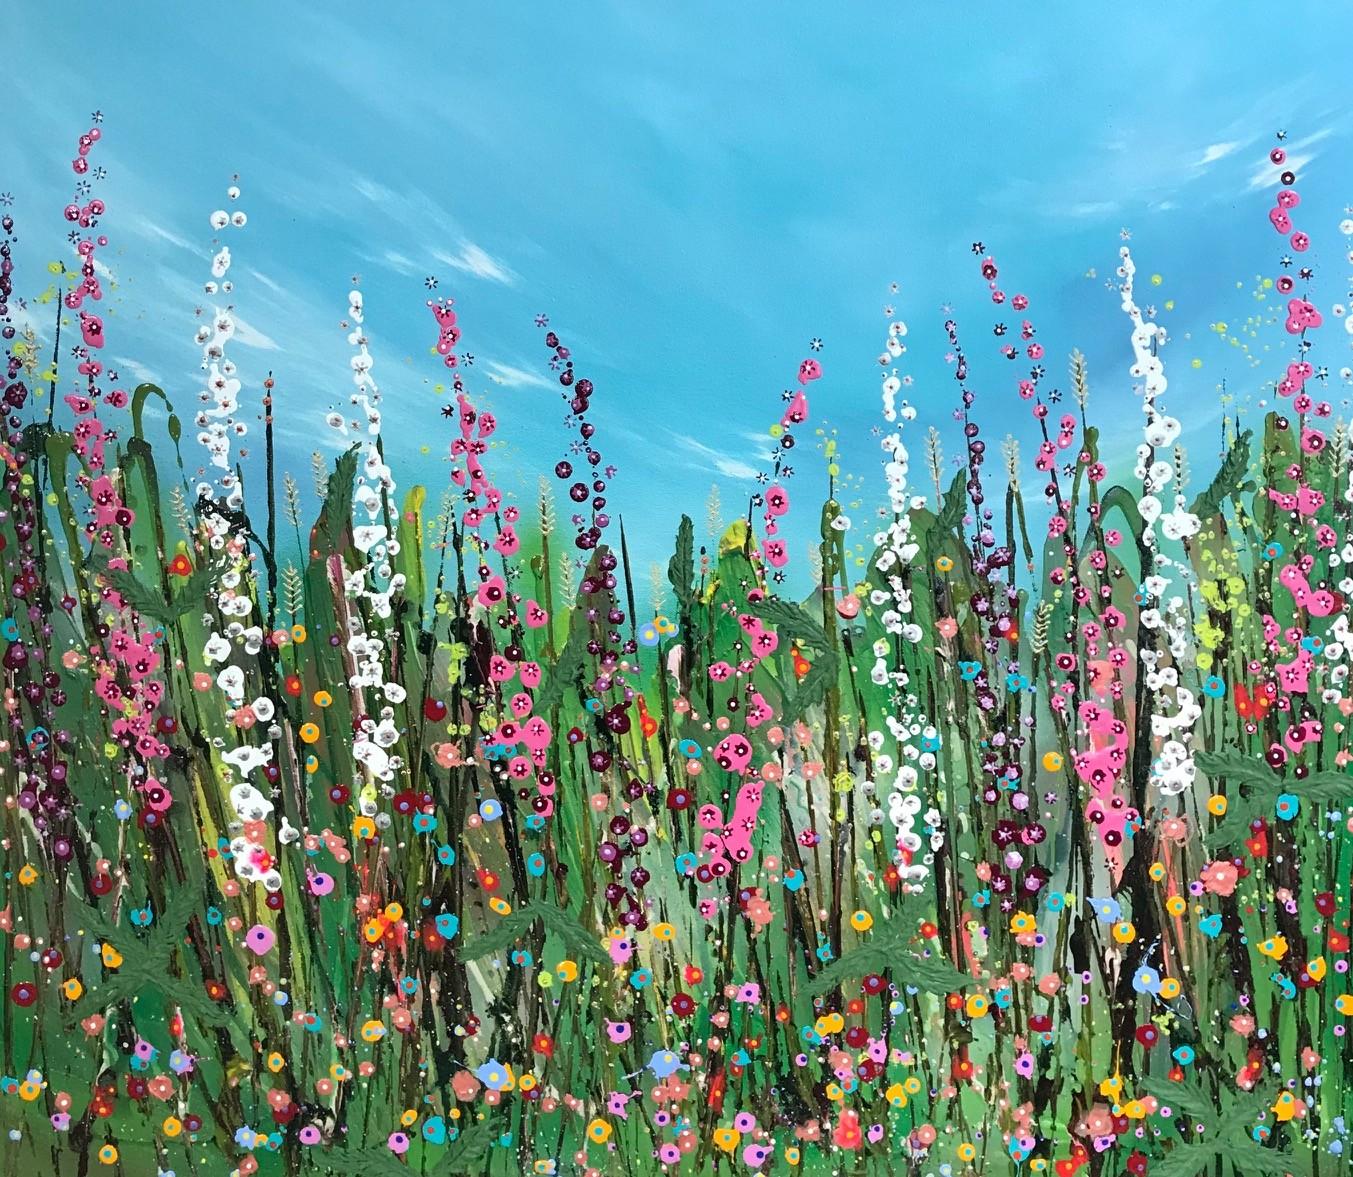 Nicky Chubb, Happy Dance I, 2020, £995, acrylic, original, The Art Agency